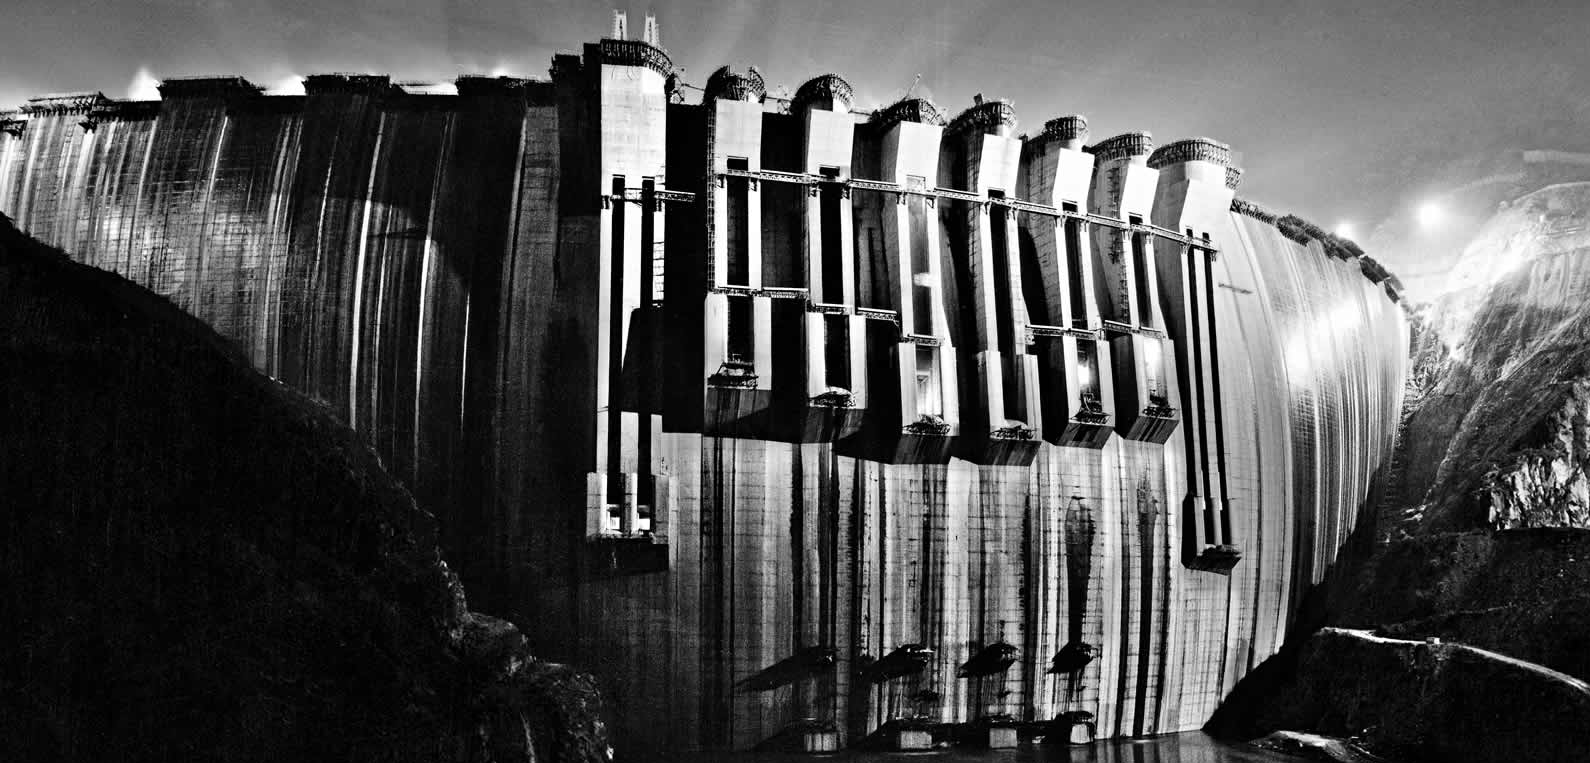 Cyclopica - Centrale idroelettrica, Cina - 1988